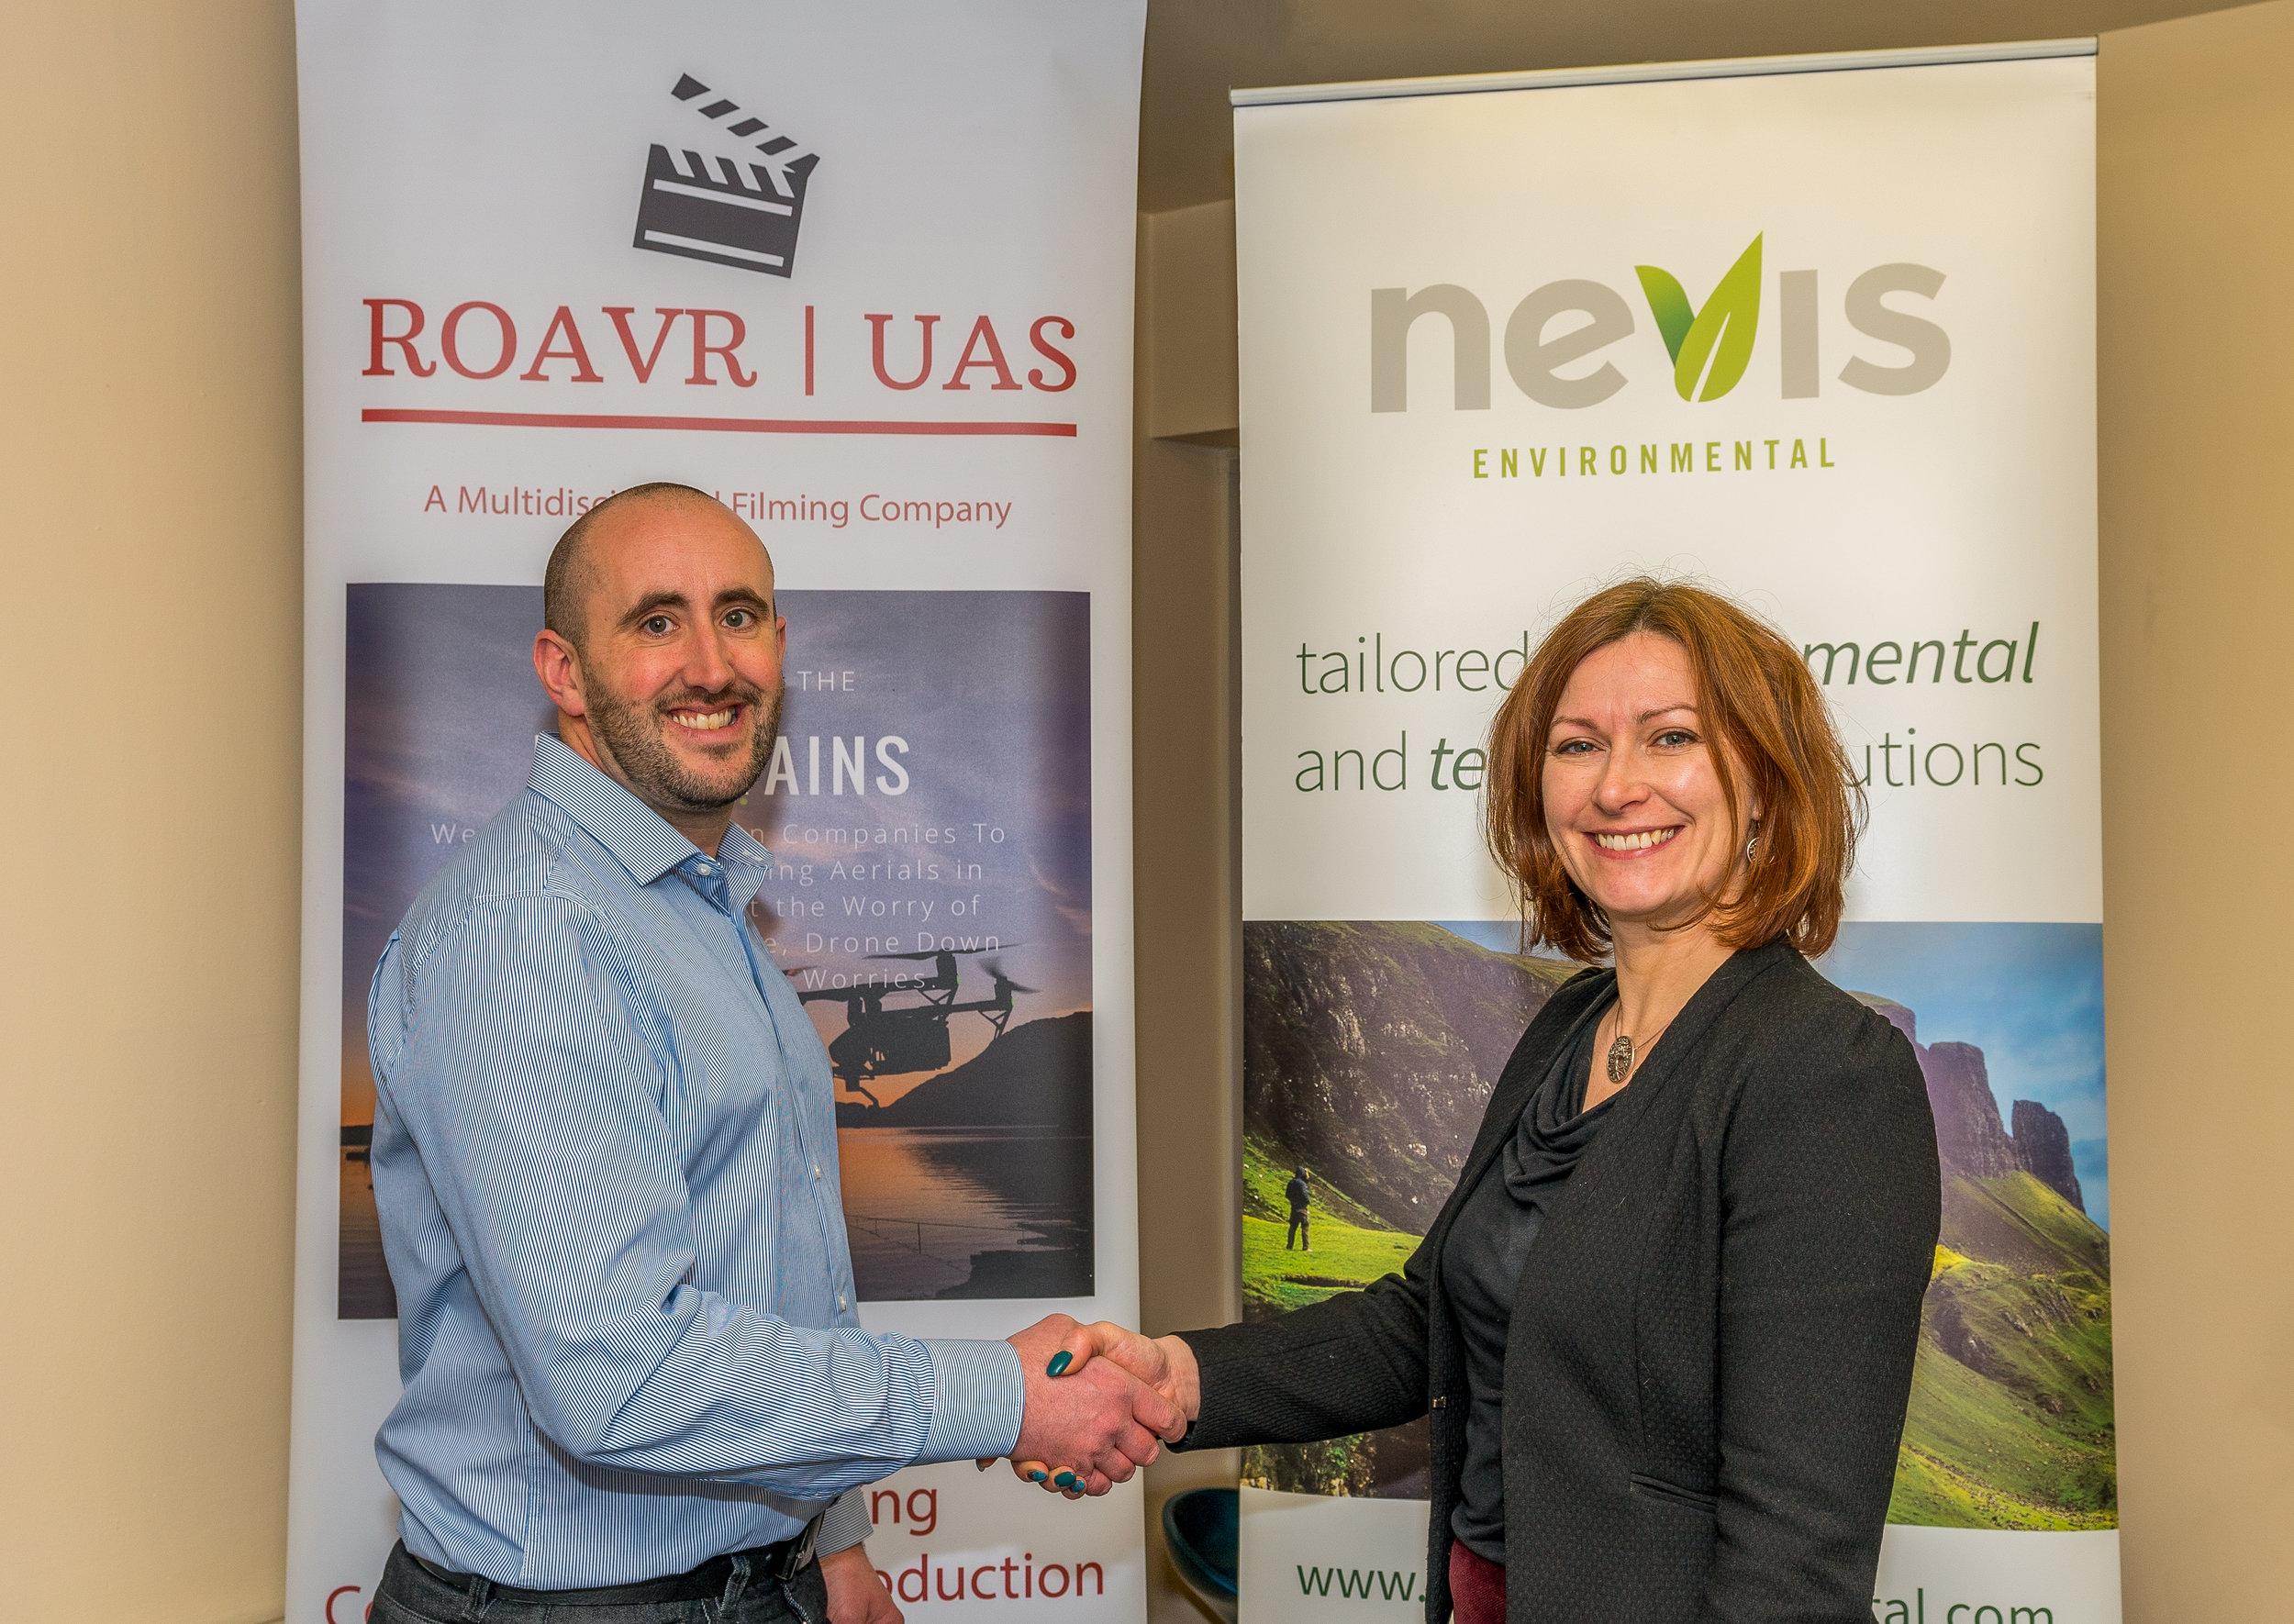 Matt Harmsworth (Director of ROAVR) and Dr. Kathryn Fraser (Director of Nevis Environmental)